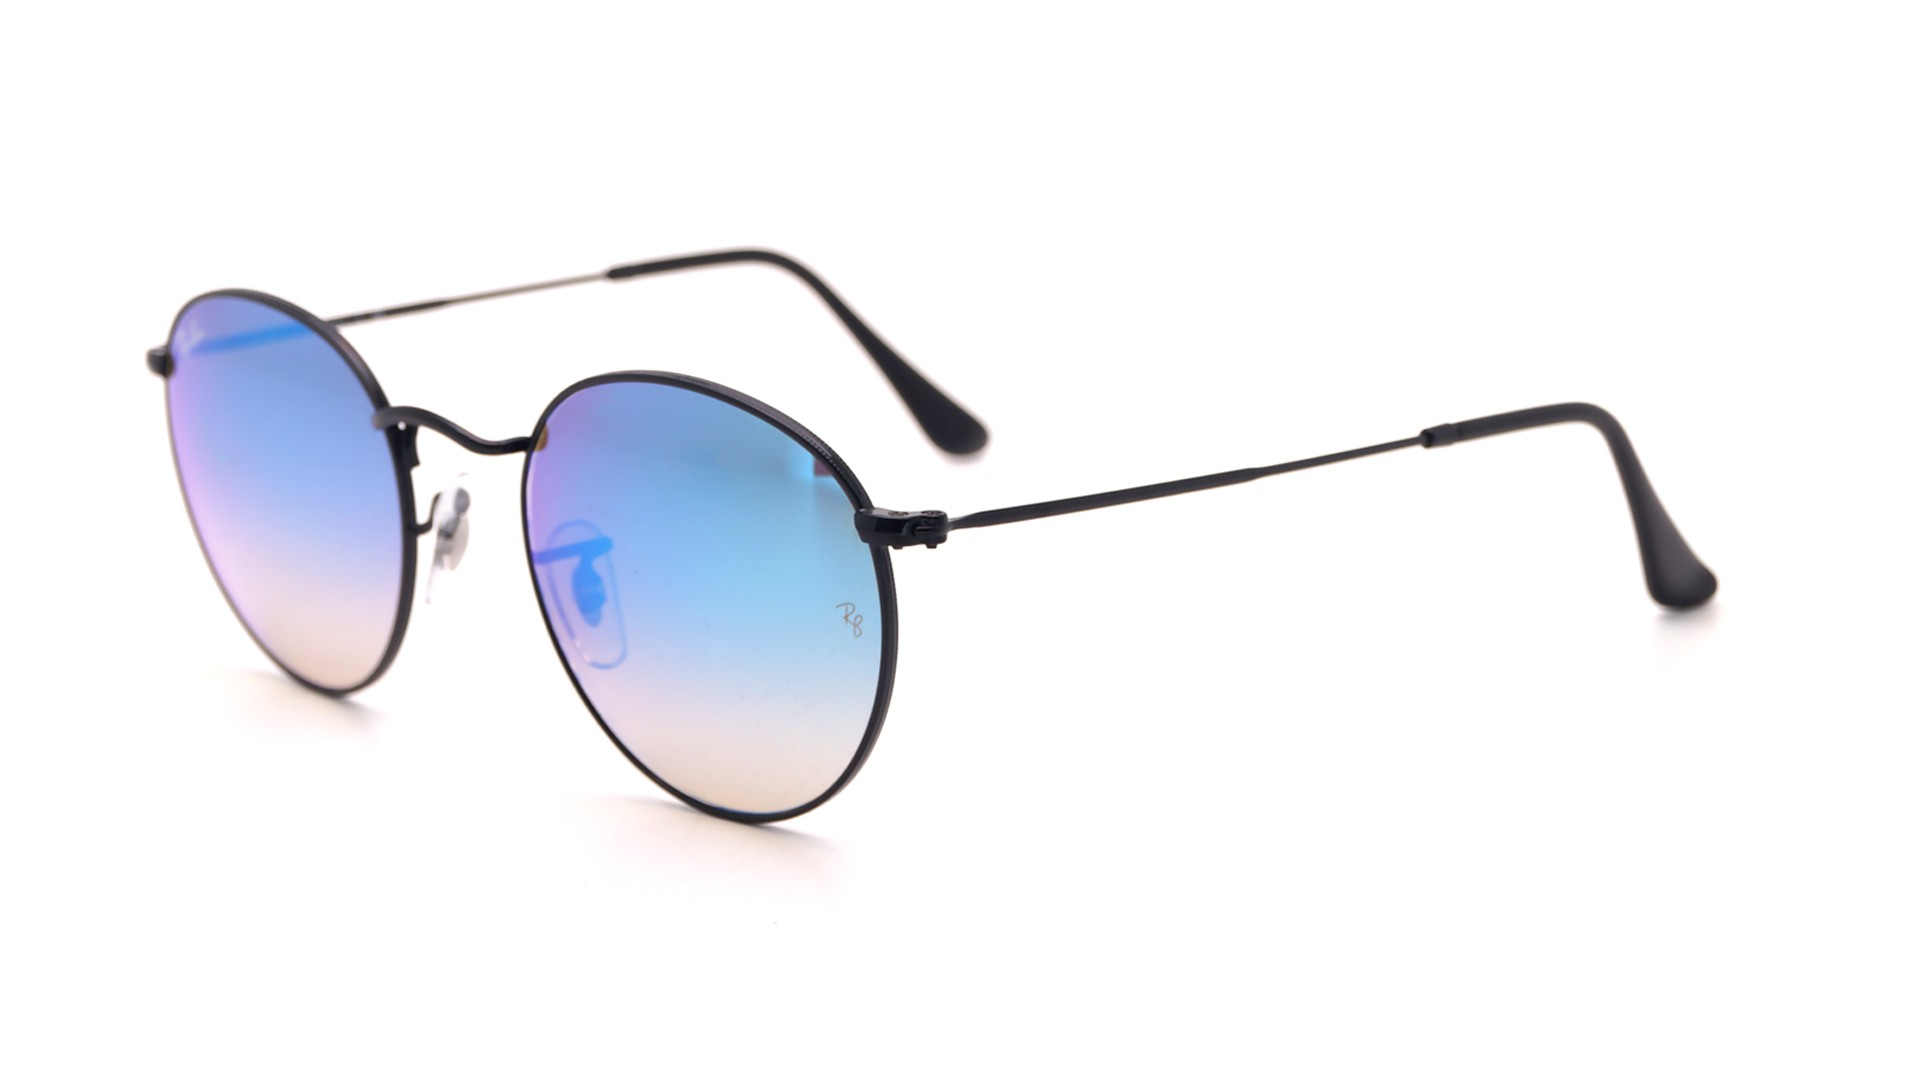 a3eee87125 Sunglasses Ray-Ban Round Metal Black RB3447 002 4O 50-21 Medium Gradient  Mirror